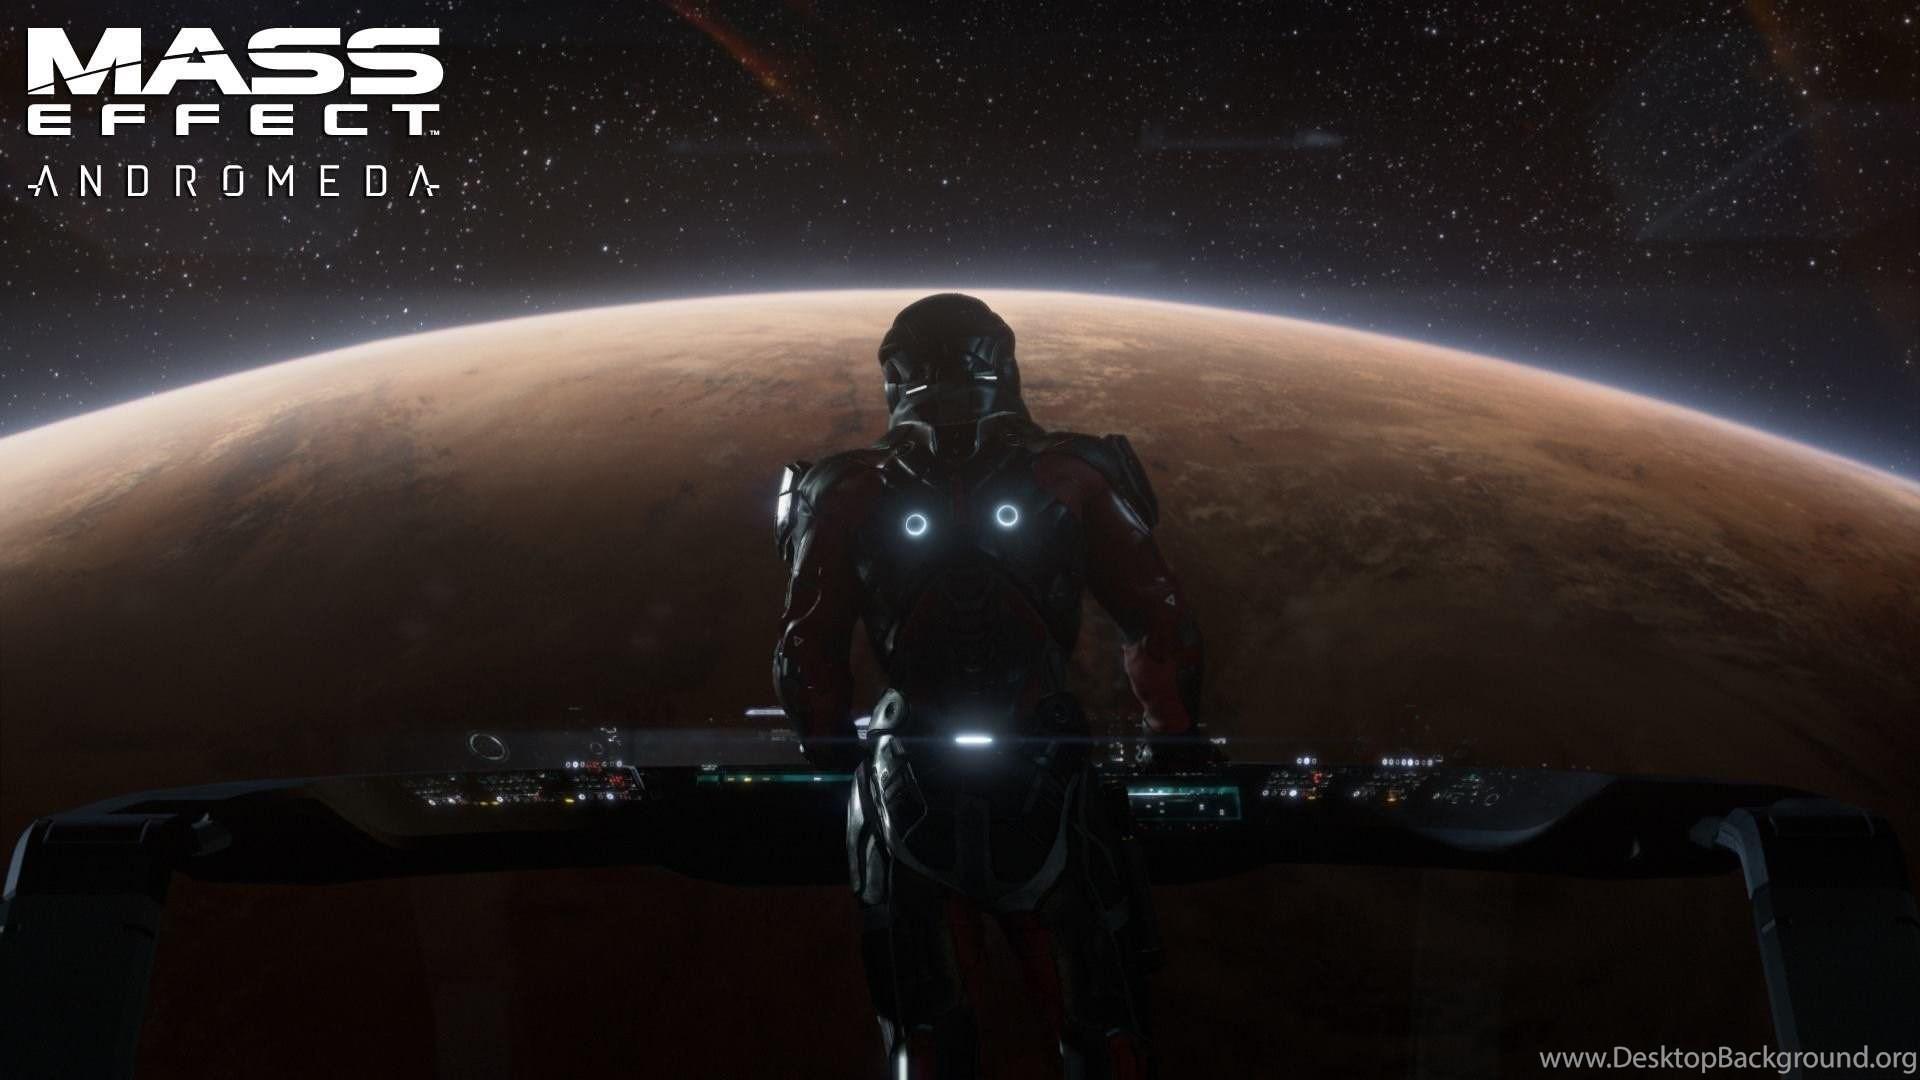 14 Mass Effect Andromeda Hd Wallpapers Desktop Background